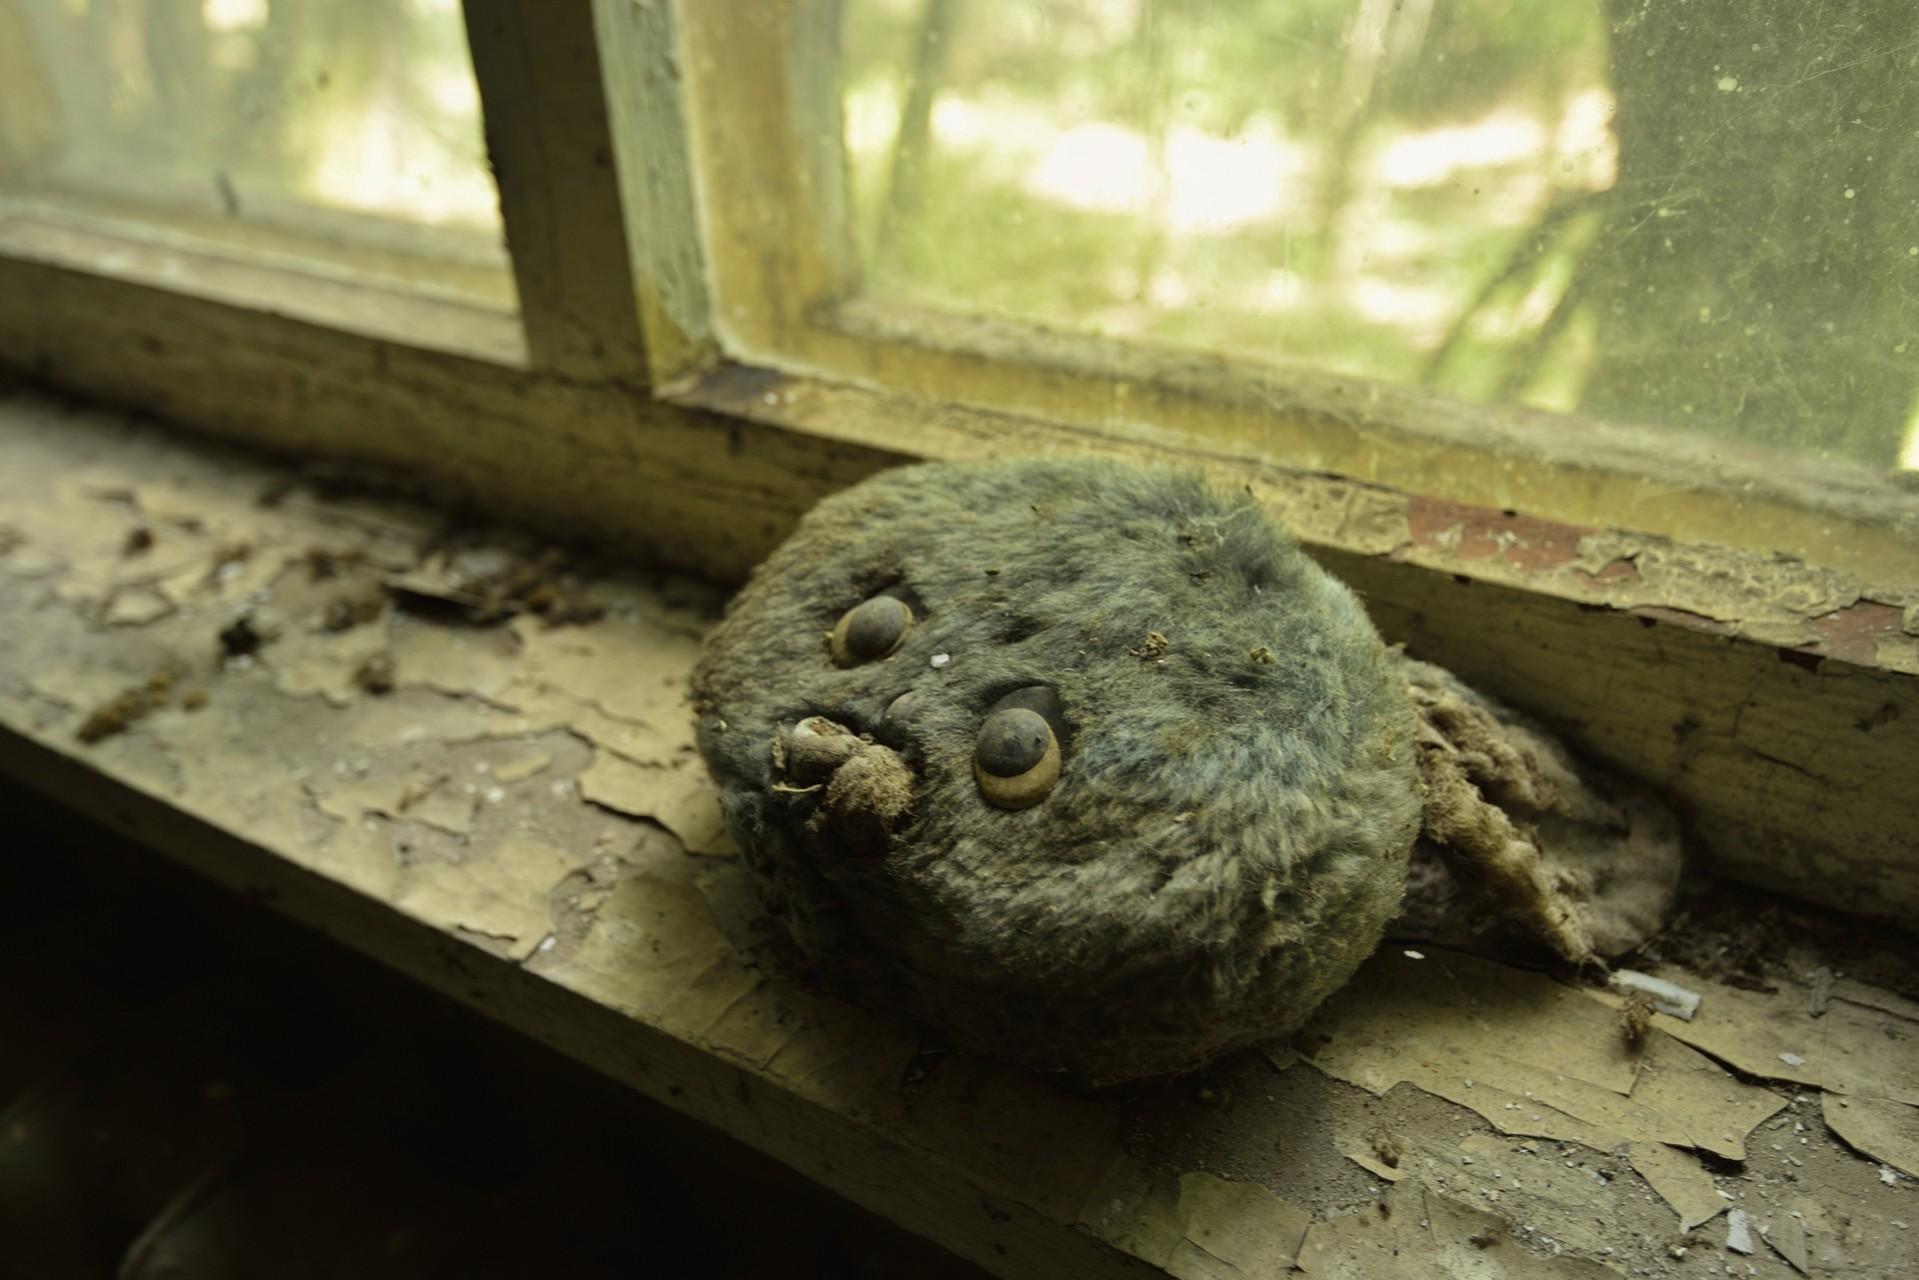 Pripyat School / Kindergarten (Chernobyl, Ukraine)